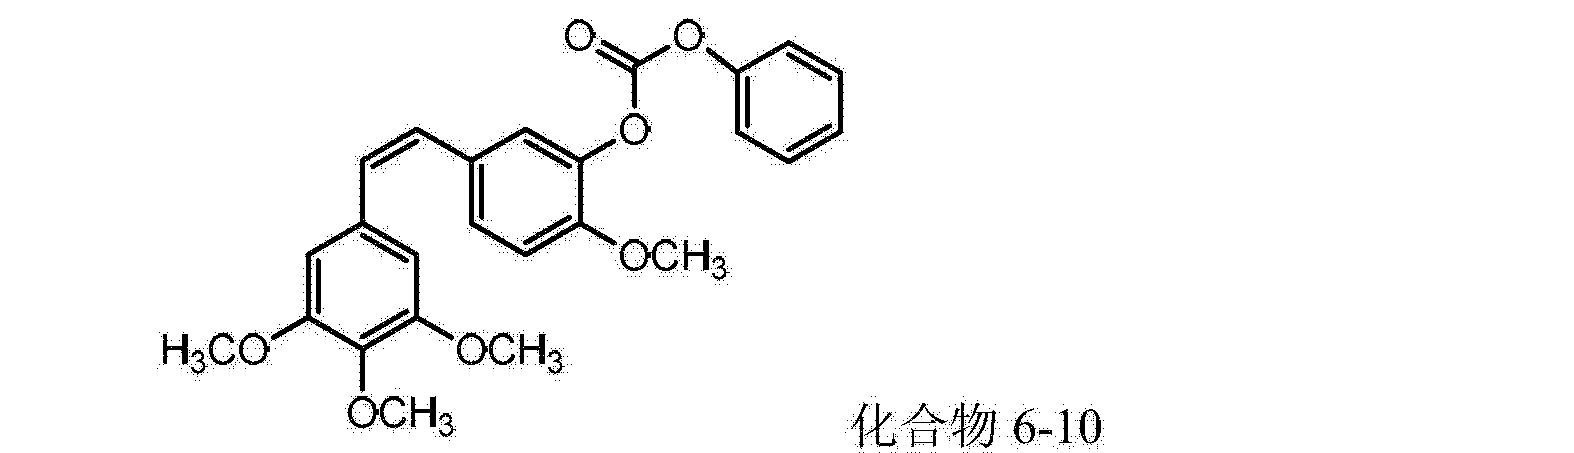 Figure CN103524349AD00141